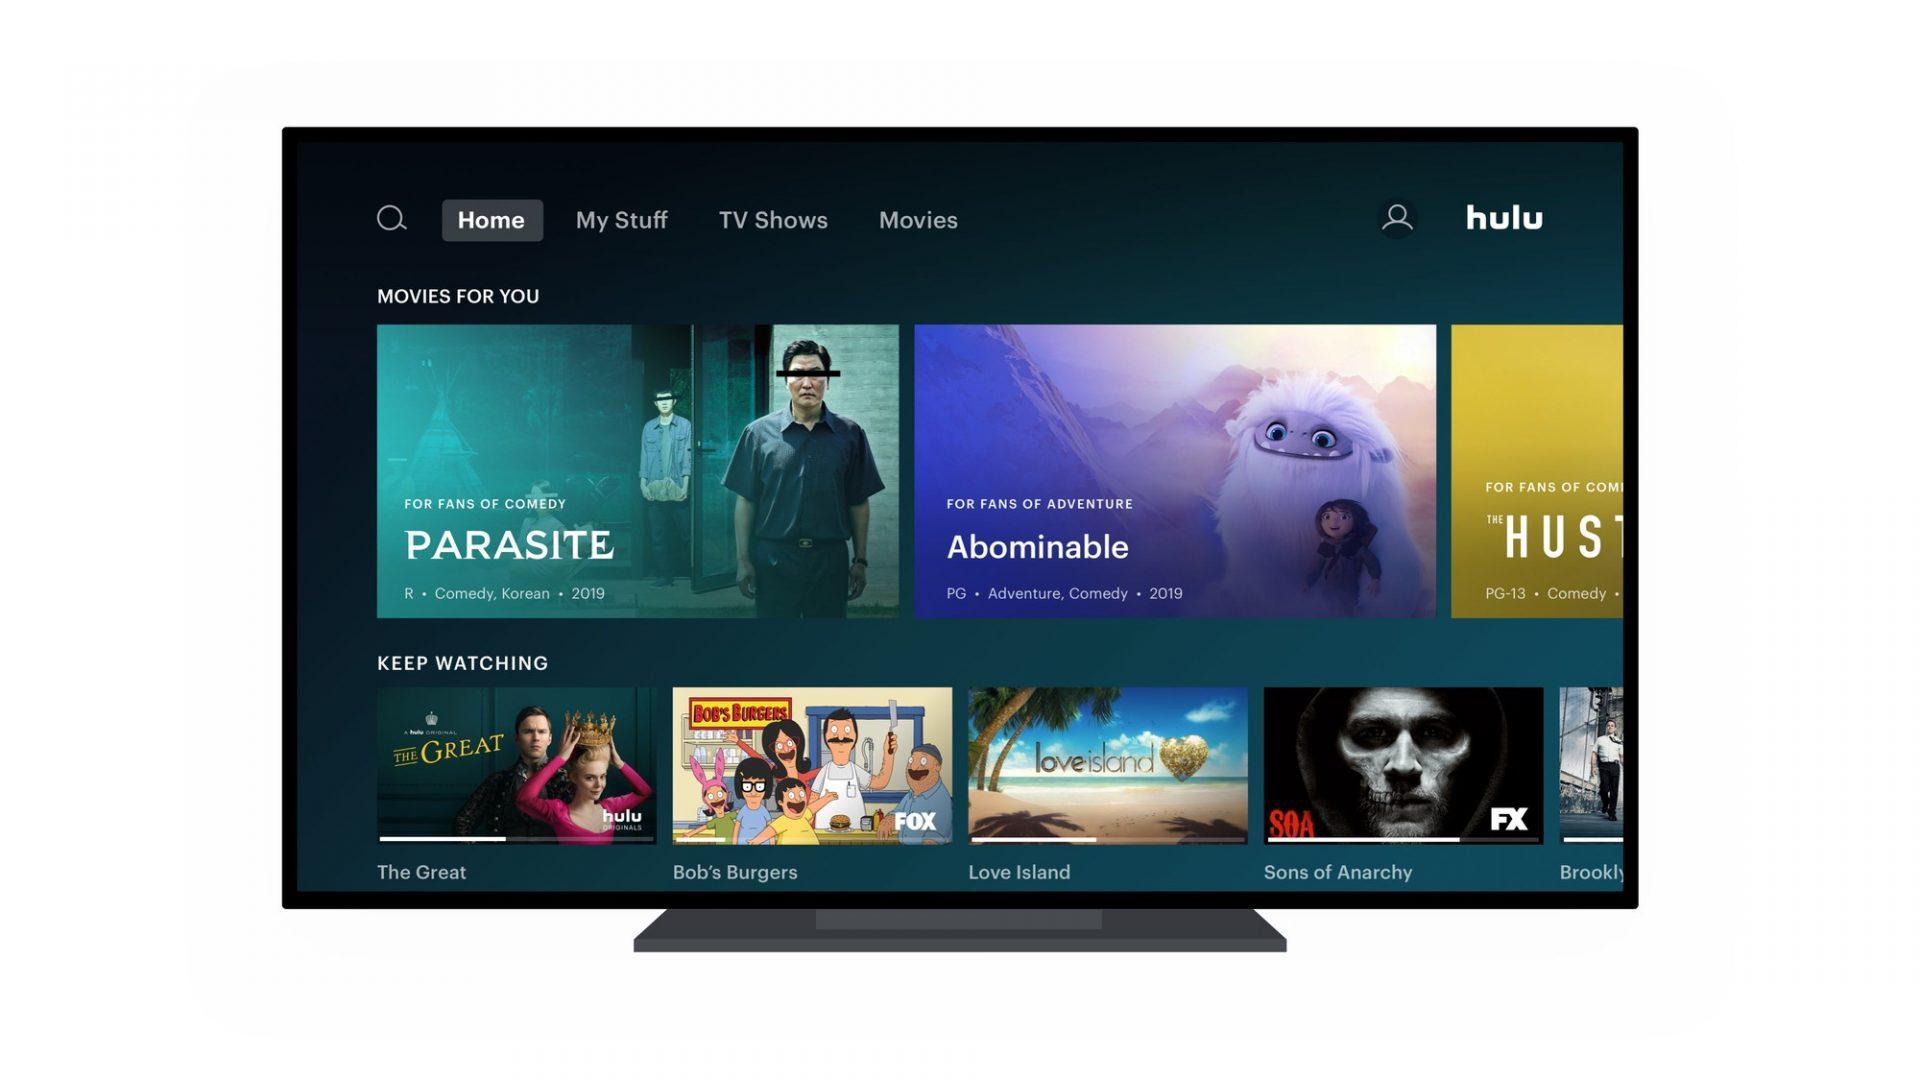 Is Hulu Becoming Too Successful for Disney? | citybiz